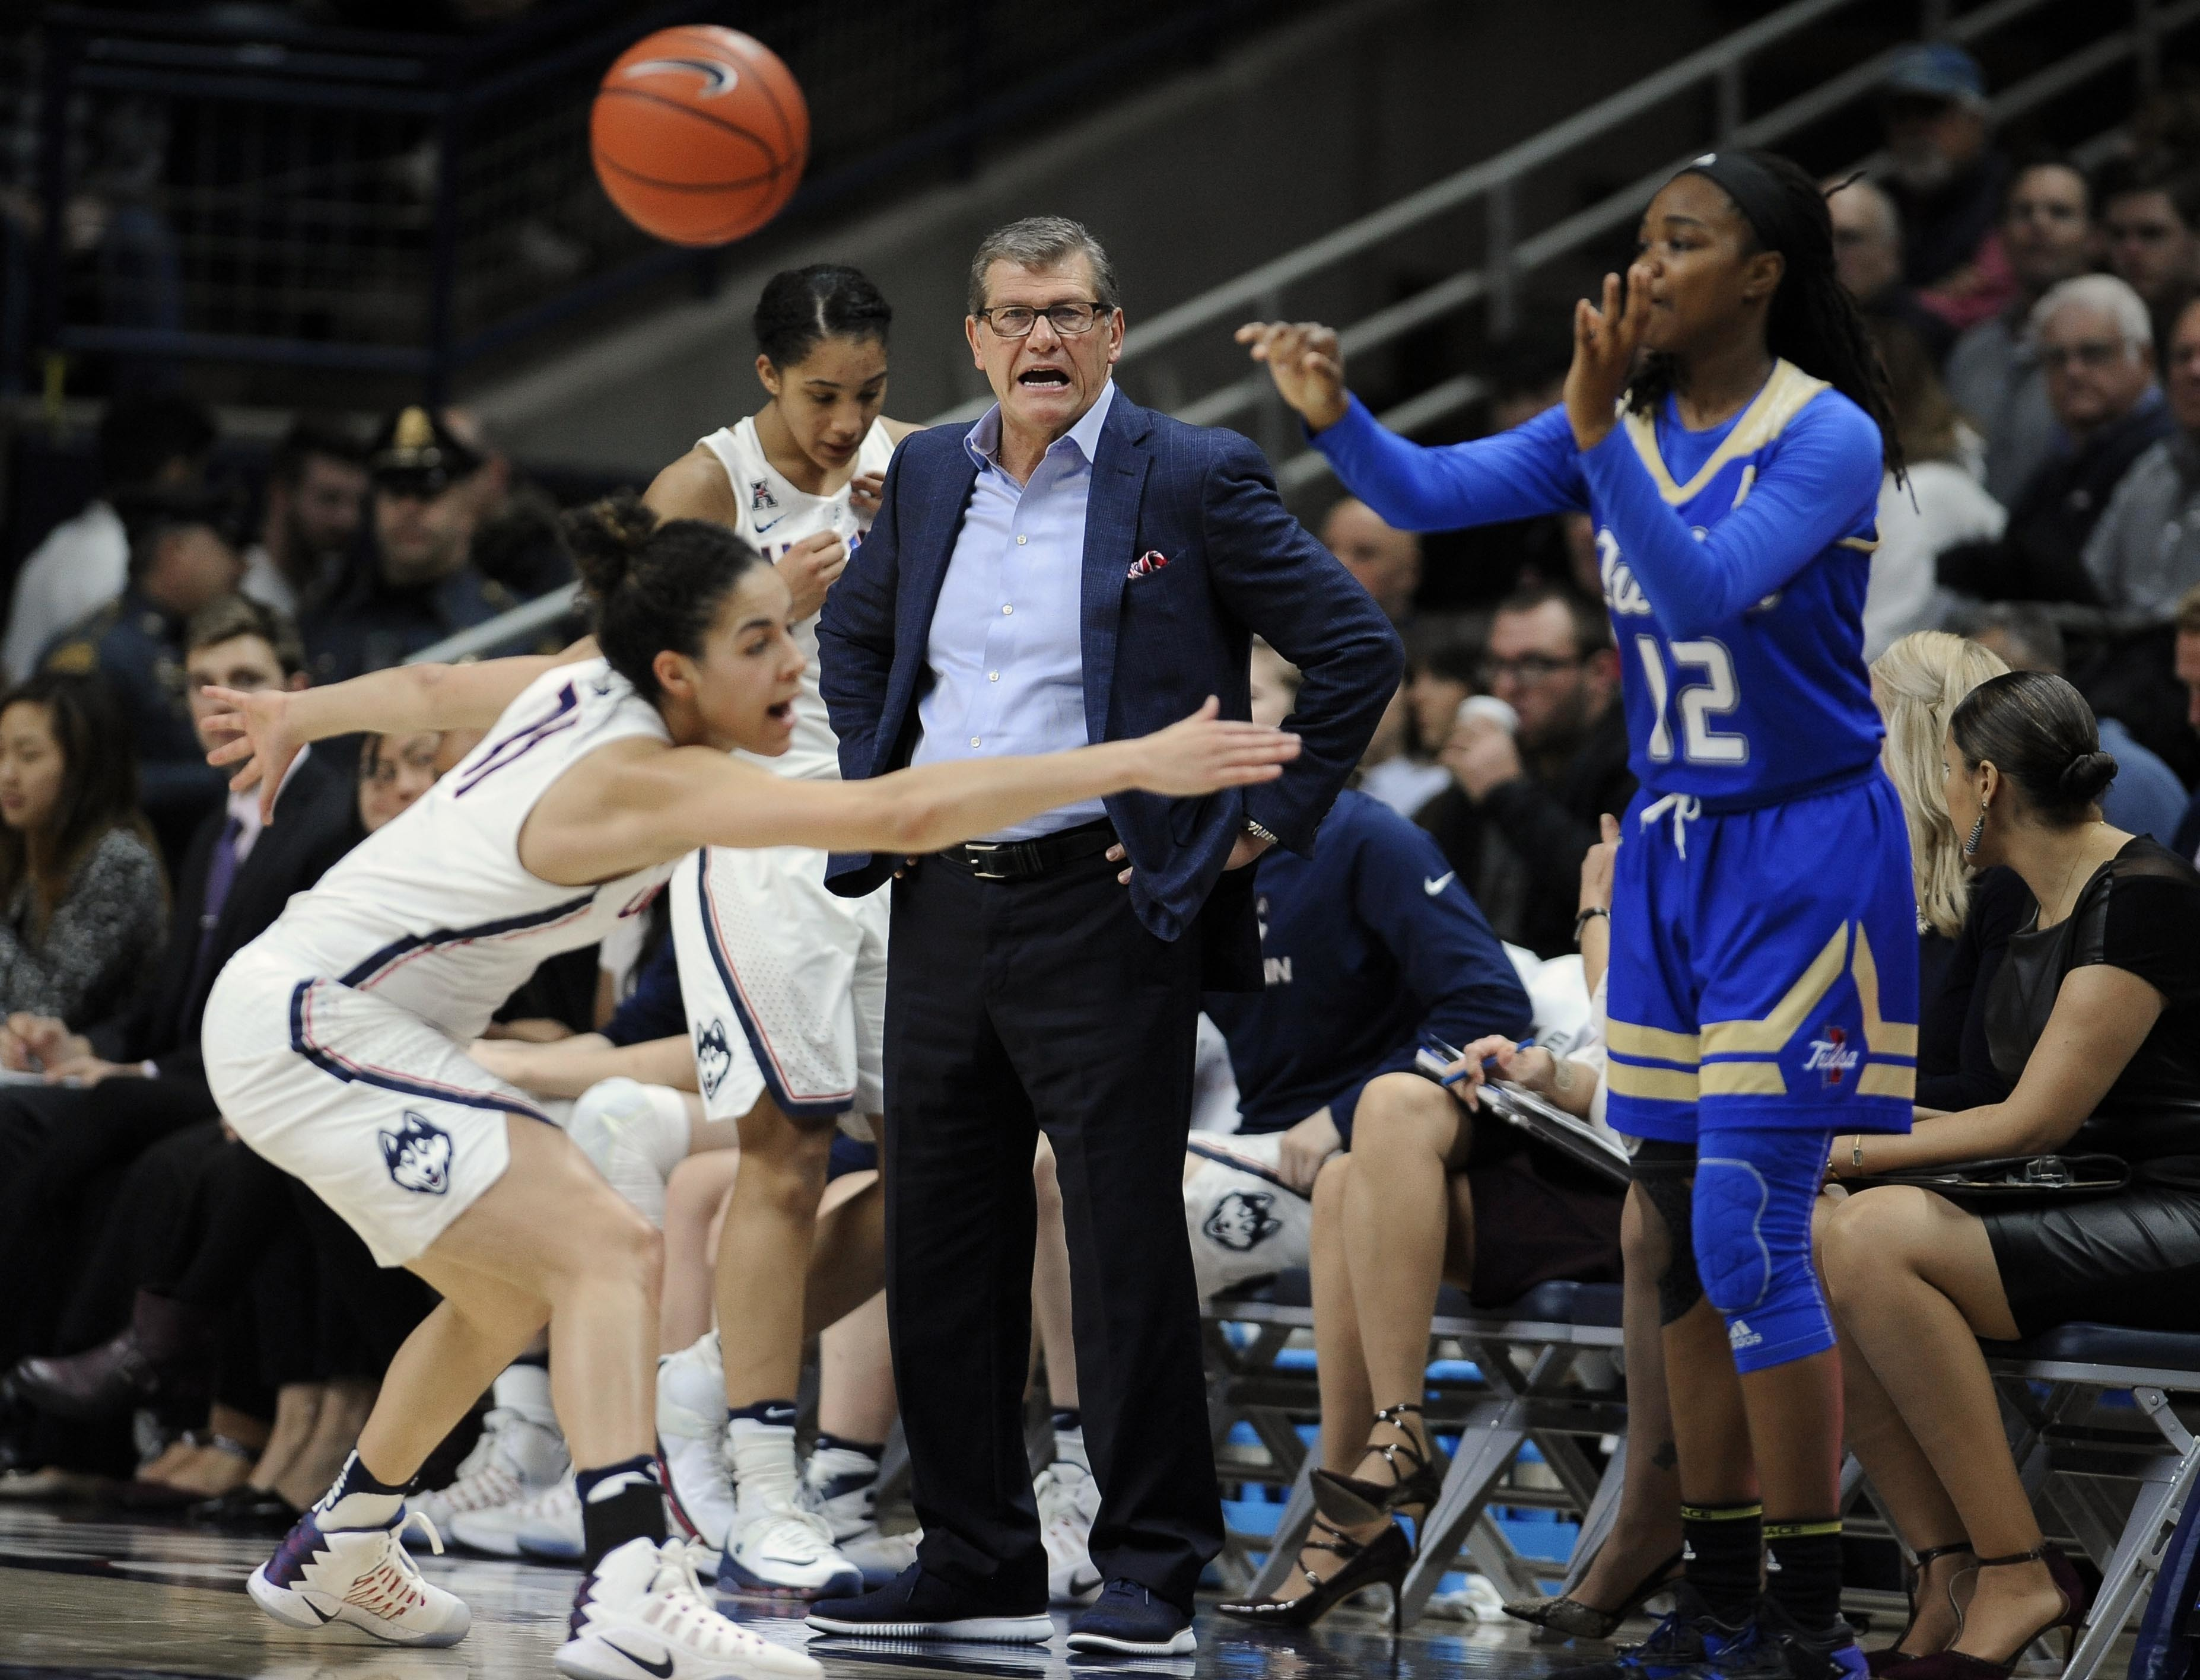 Connecticut head coach Geno Auriemma, center, calls to Connecticut's Kia Nurse, left, as Tulsa's Shug Dickson inbounds the ball in the half of an NCAA college basketball game, Sunday, Feb. 5, 2017, in Storrs, Conn. (AP Photo/Jessica Hill)